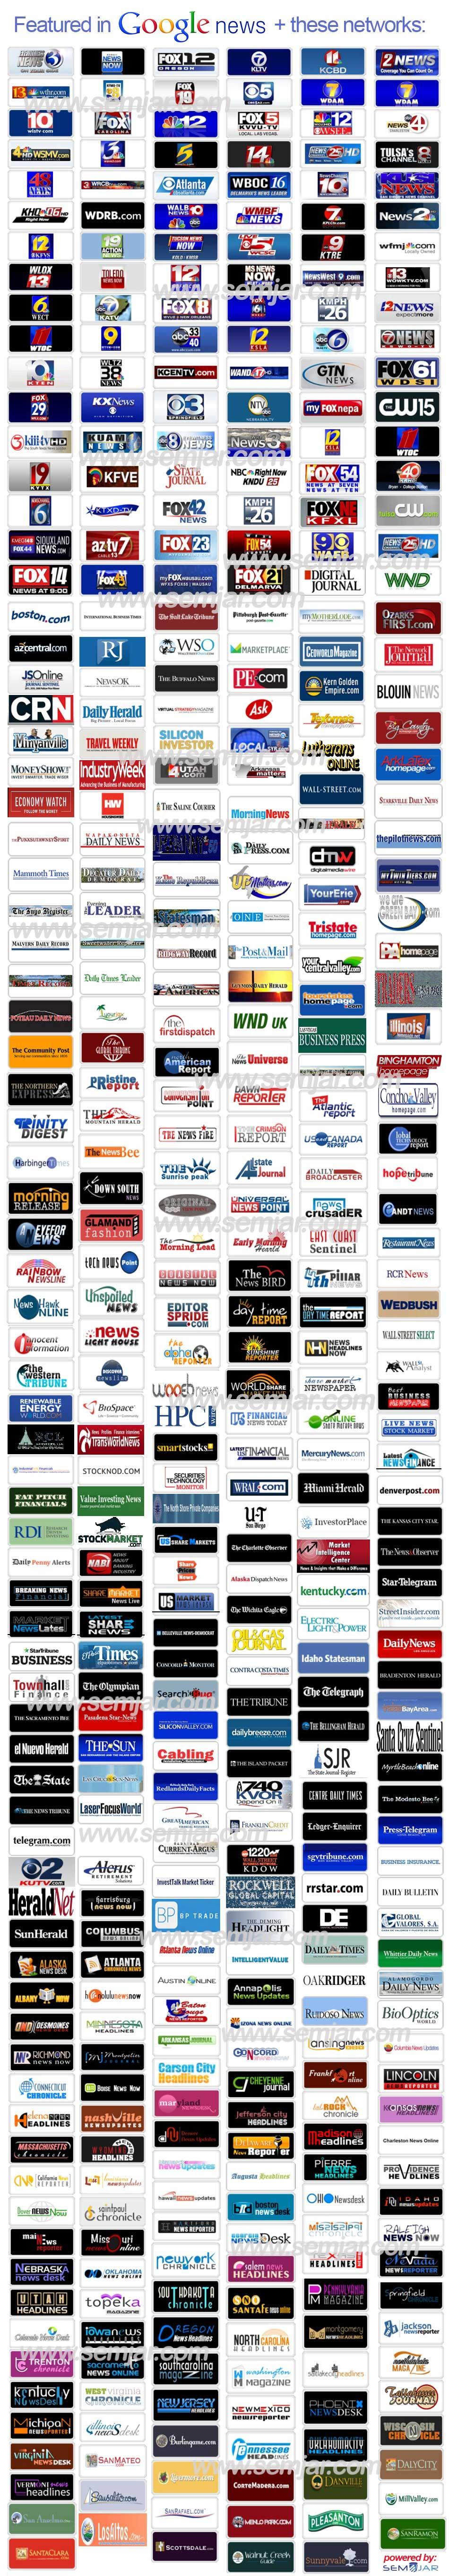 Press Release Distribution network